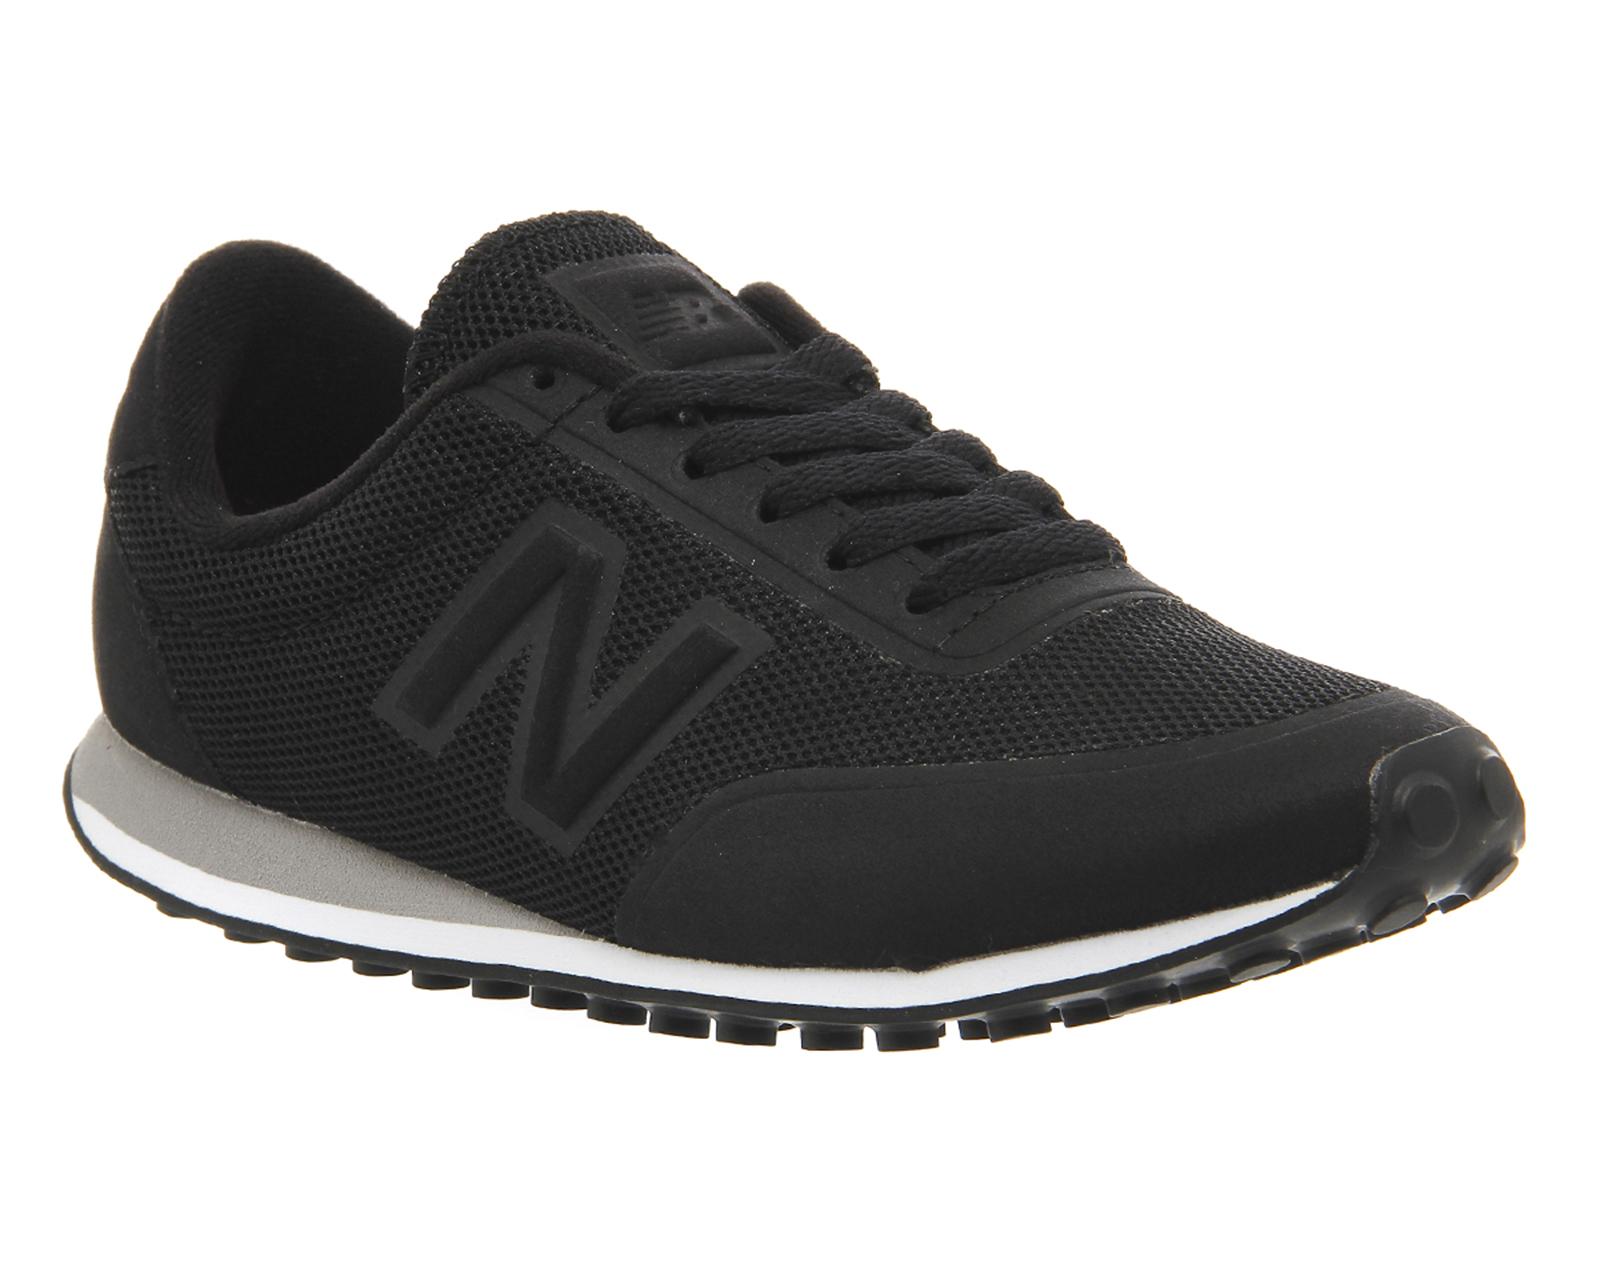 mens new balance 410 microfibre mesh black trainers shoes. Black Bedroom Furniture Sets. Home Design Ideas